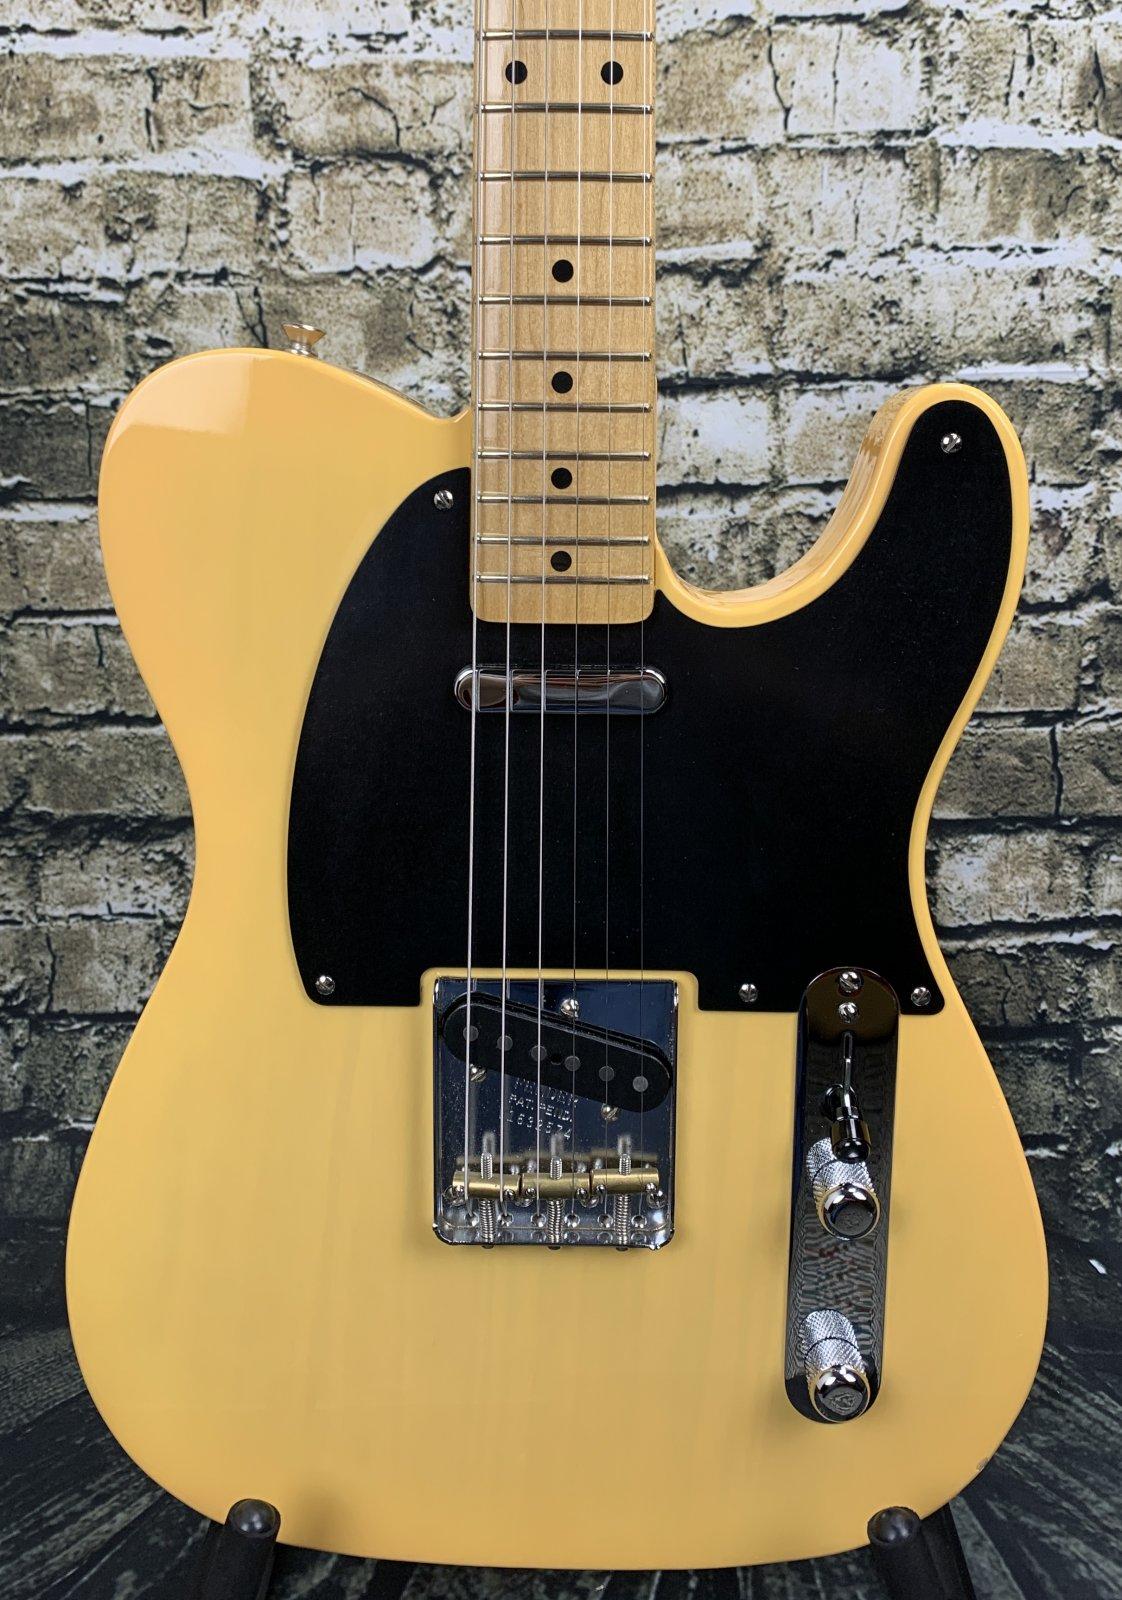 Fender 2016 American Vintage '52 Telecaster - Butterscotch Blonde